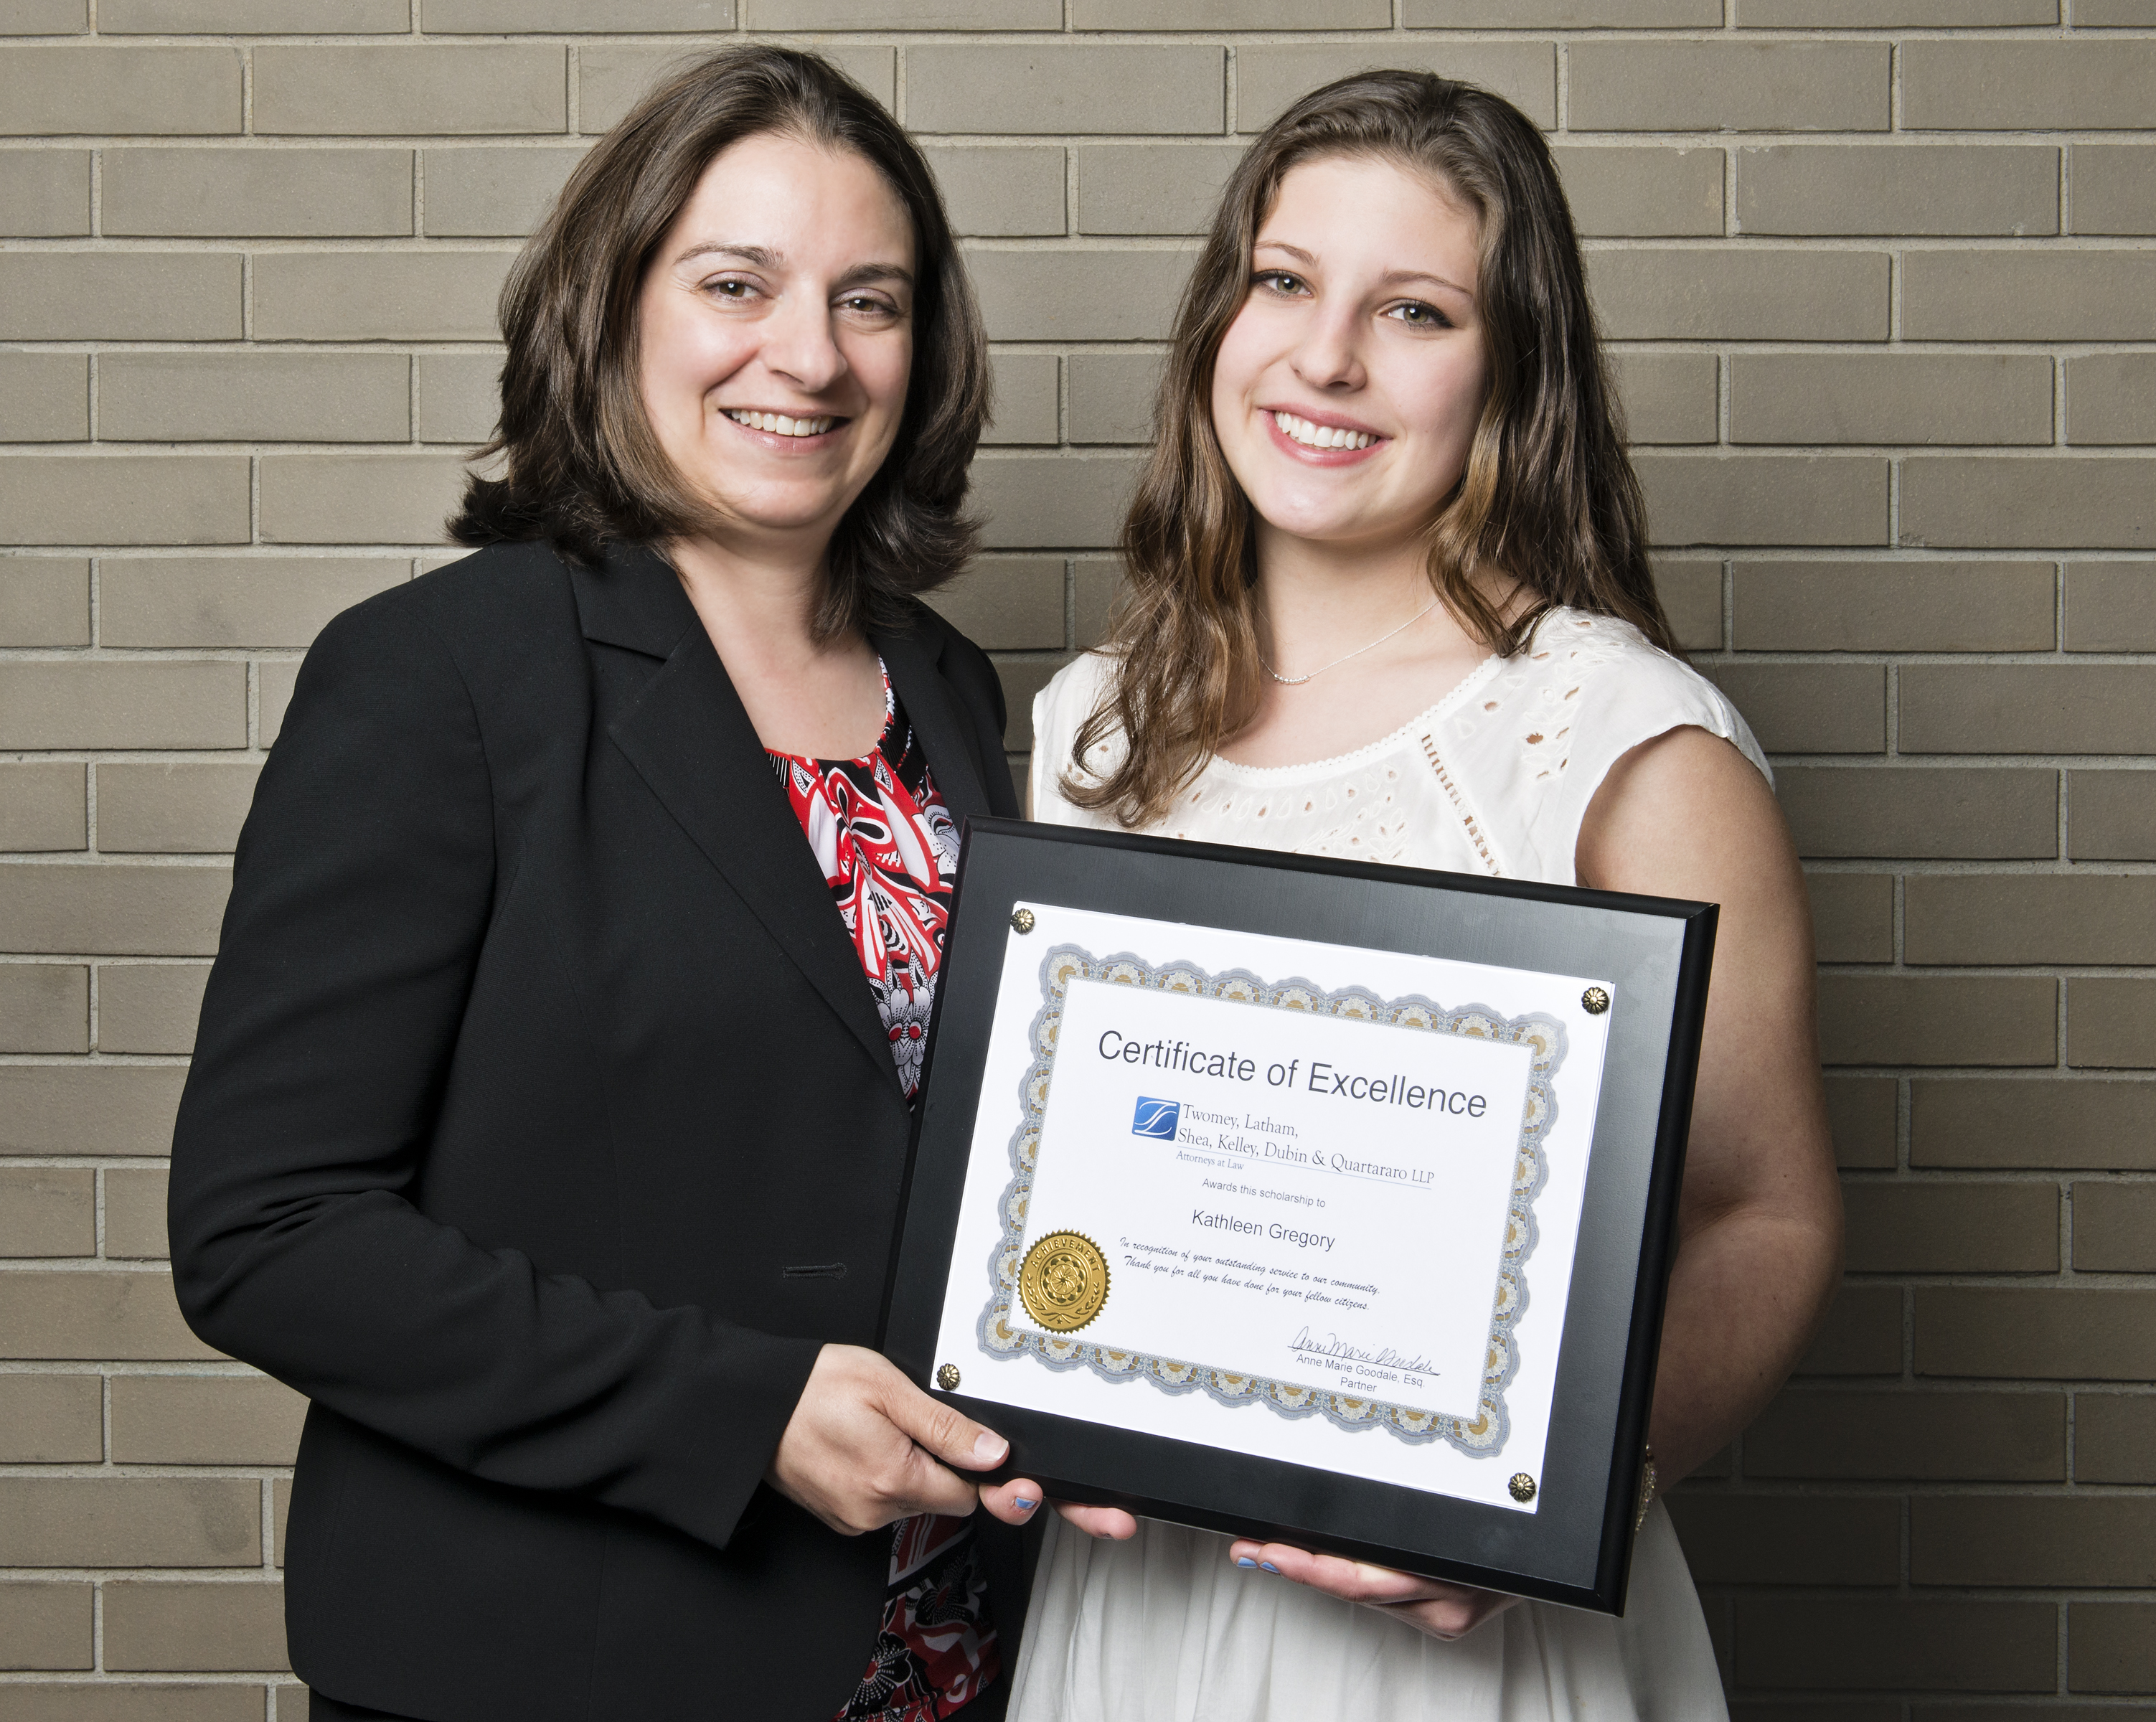 Riverhead high school scholarship recipient Kathleen Gregory with associate Bernadette Tuthill